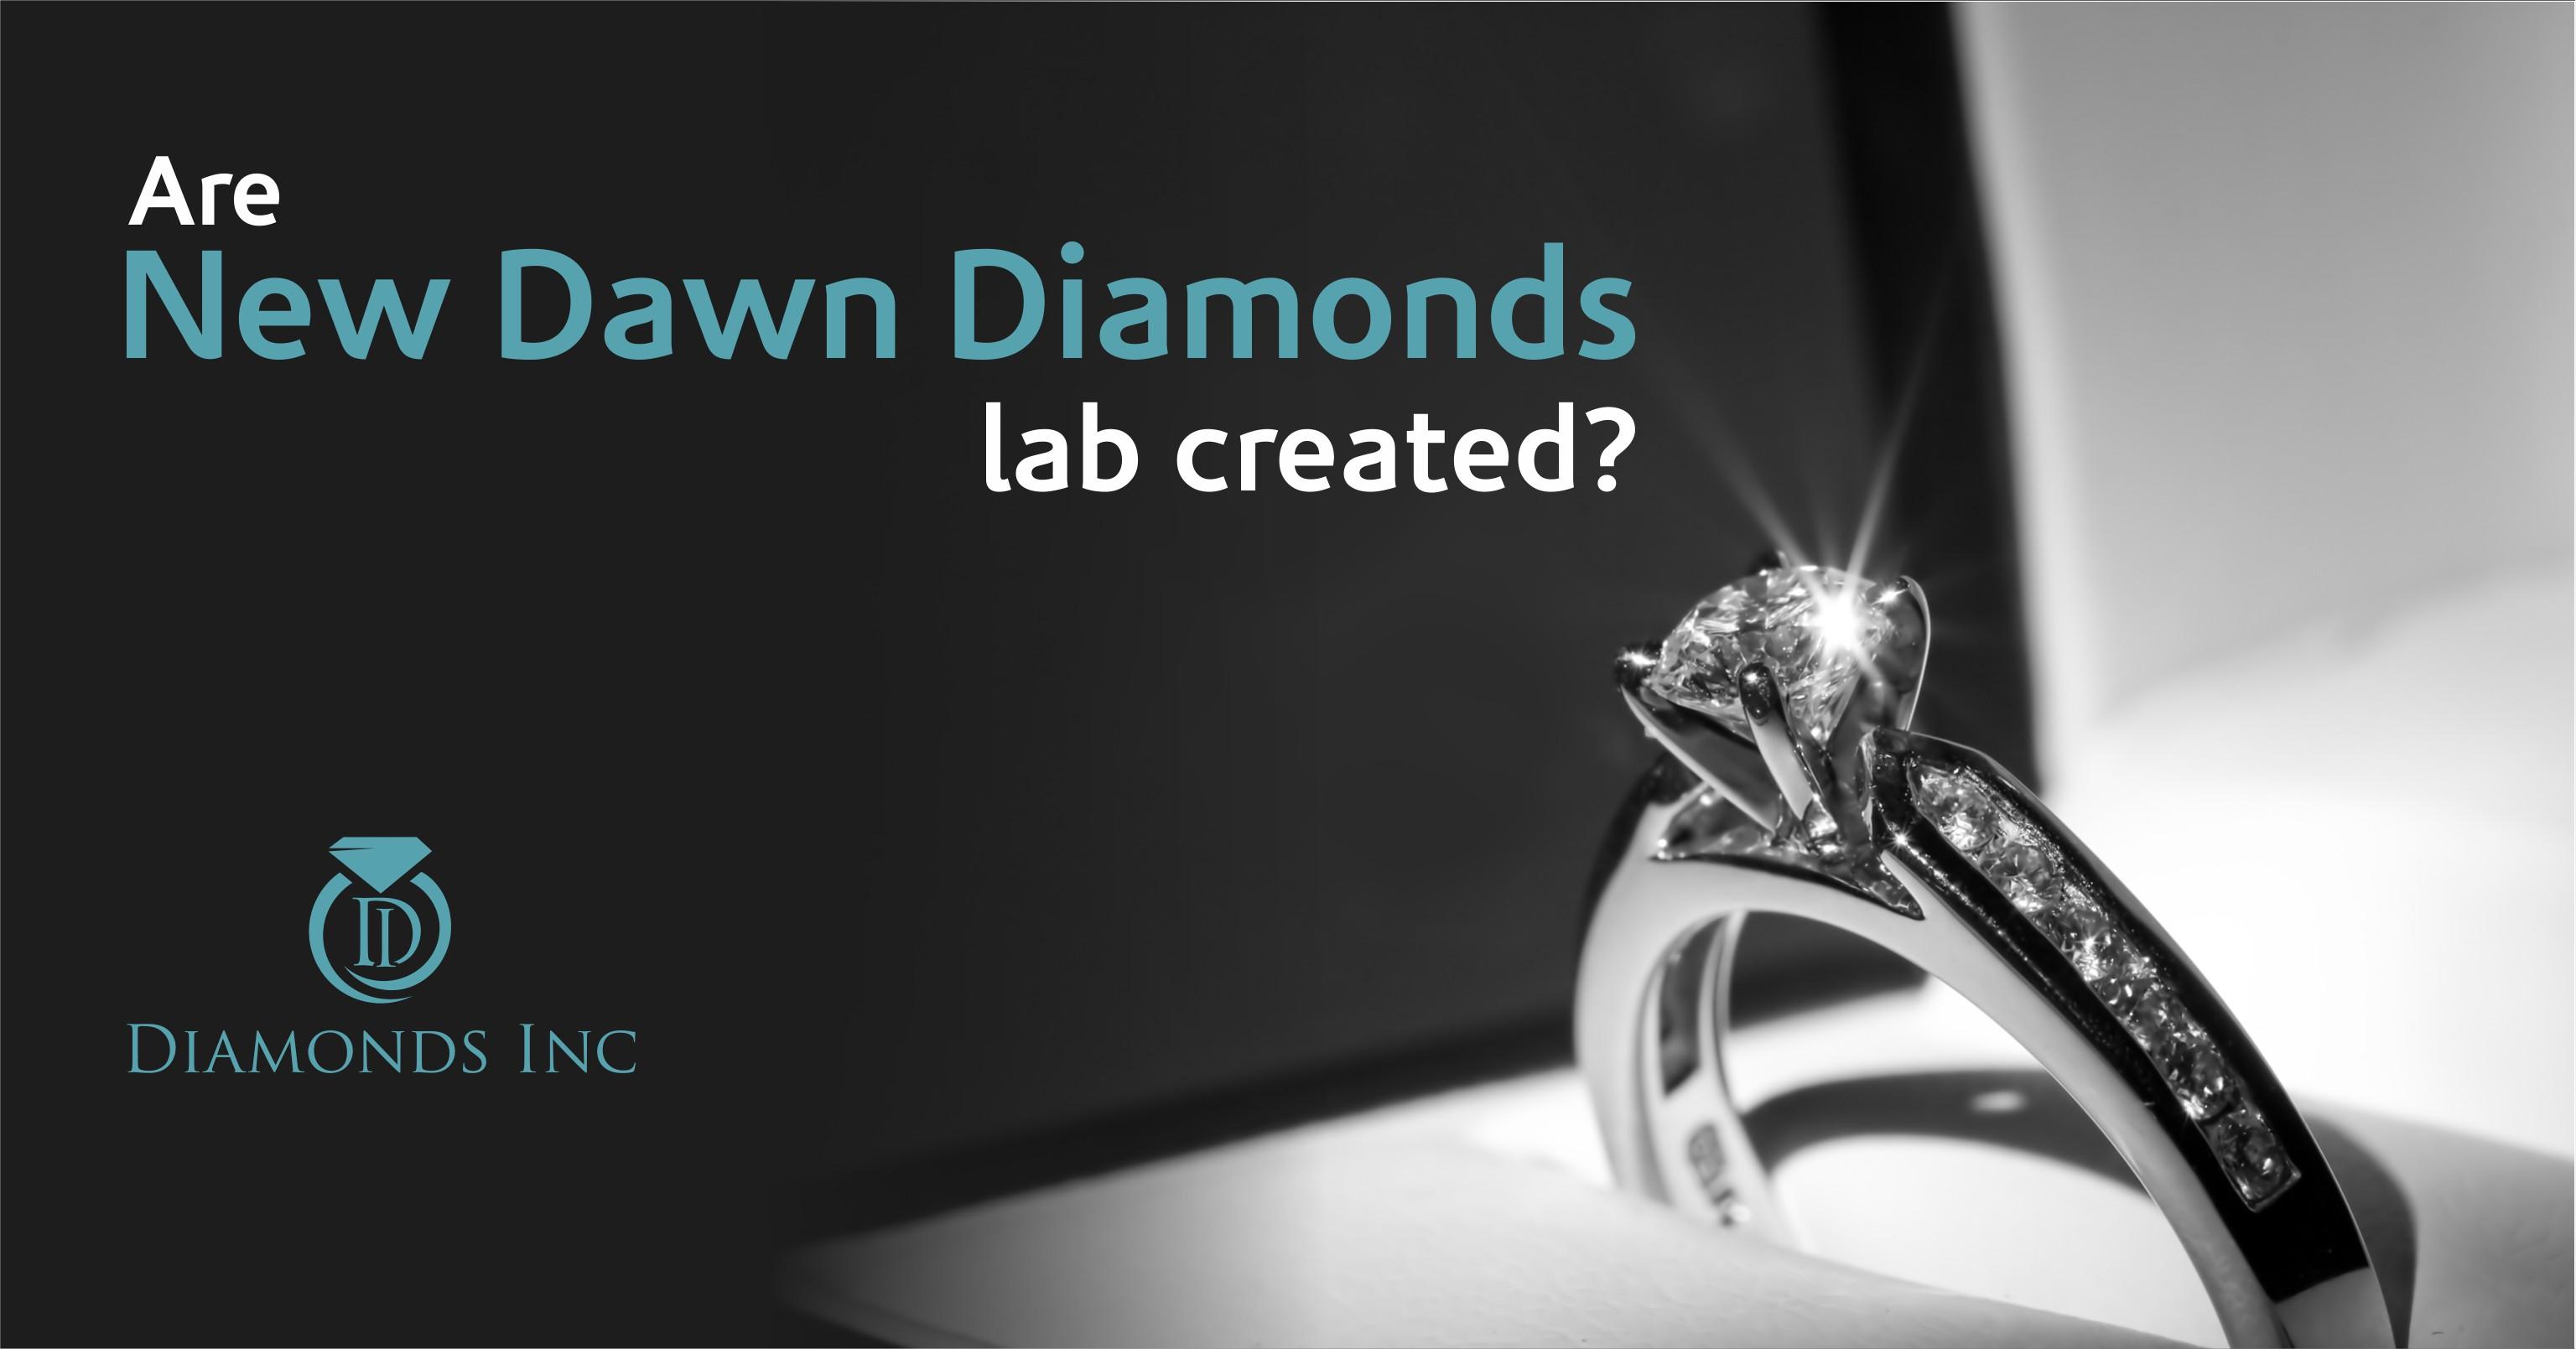 Are New Dawn Diamonds Lab Created?